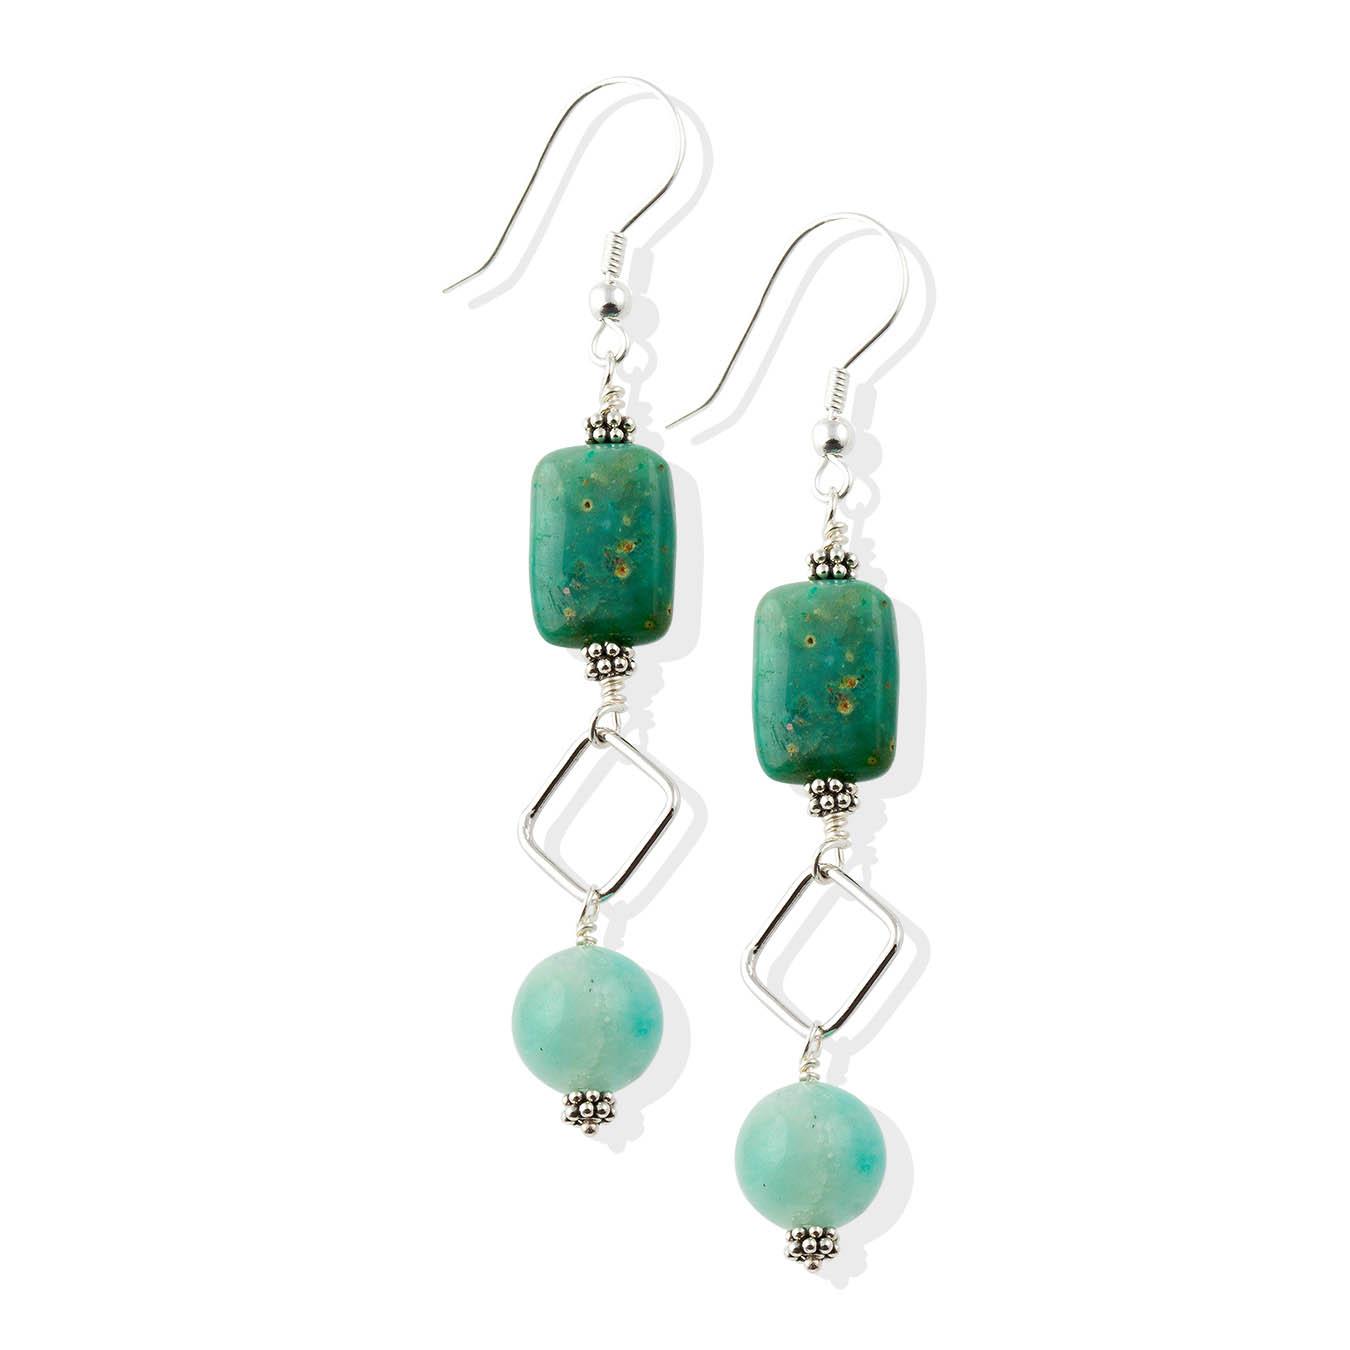 Amazonite and chrysocolla gemstones wire pendant  necklace set